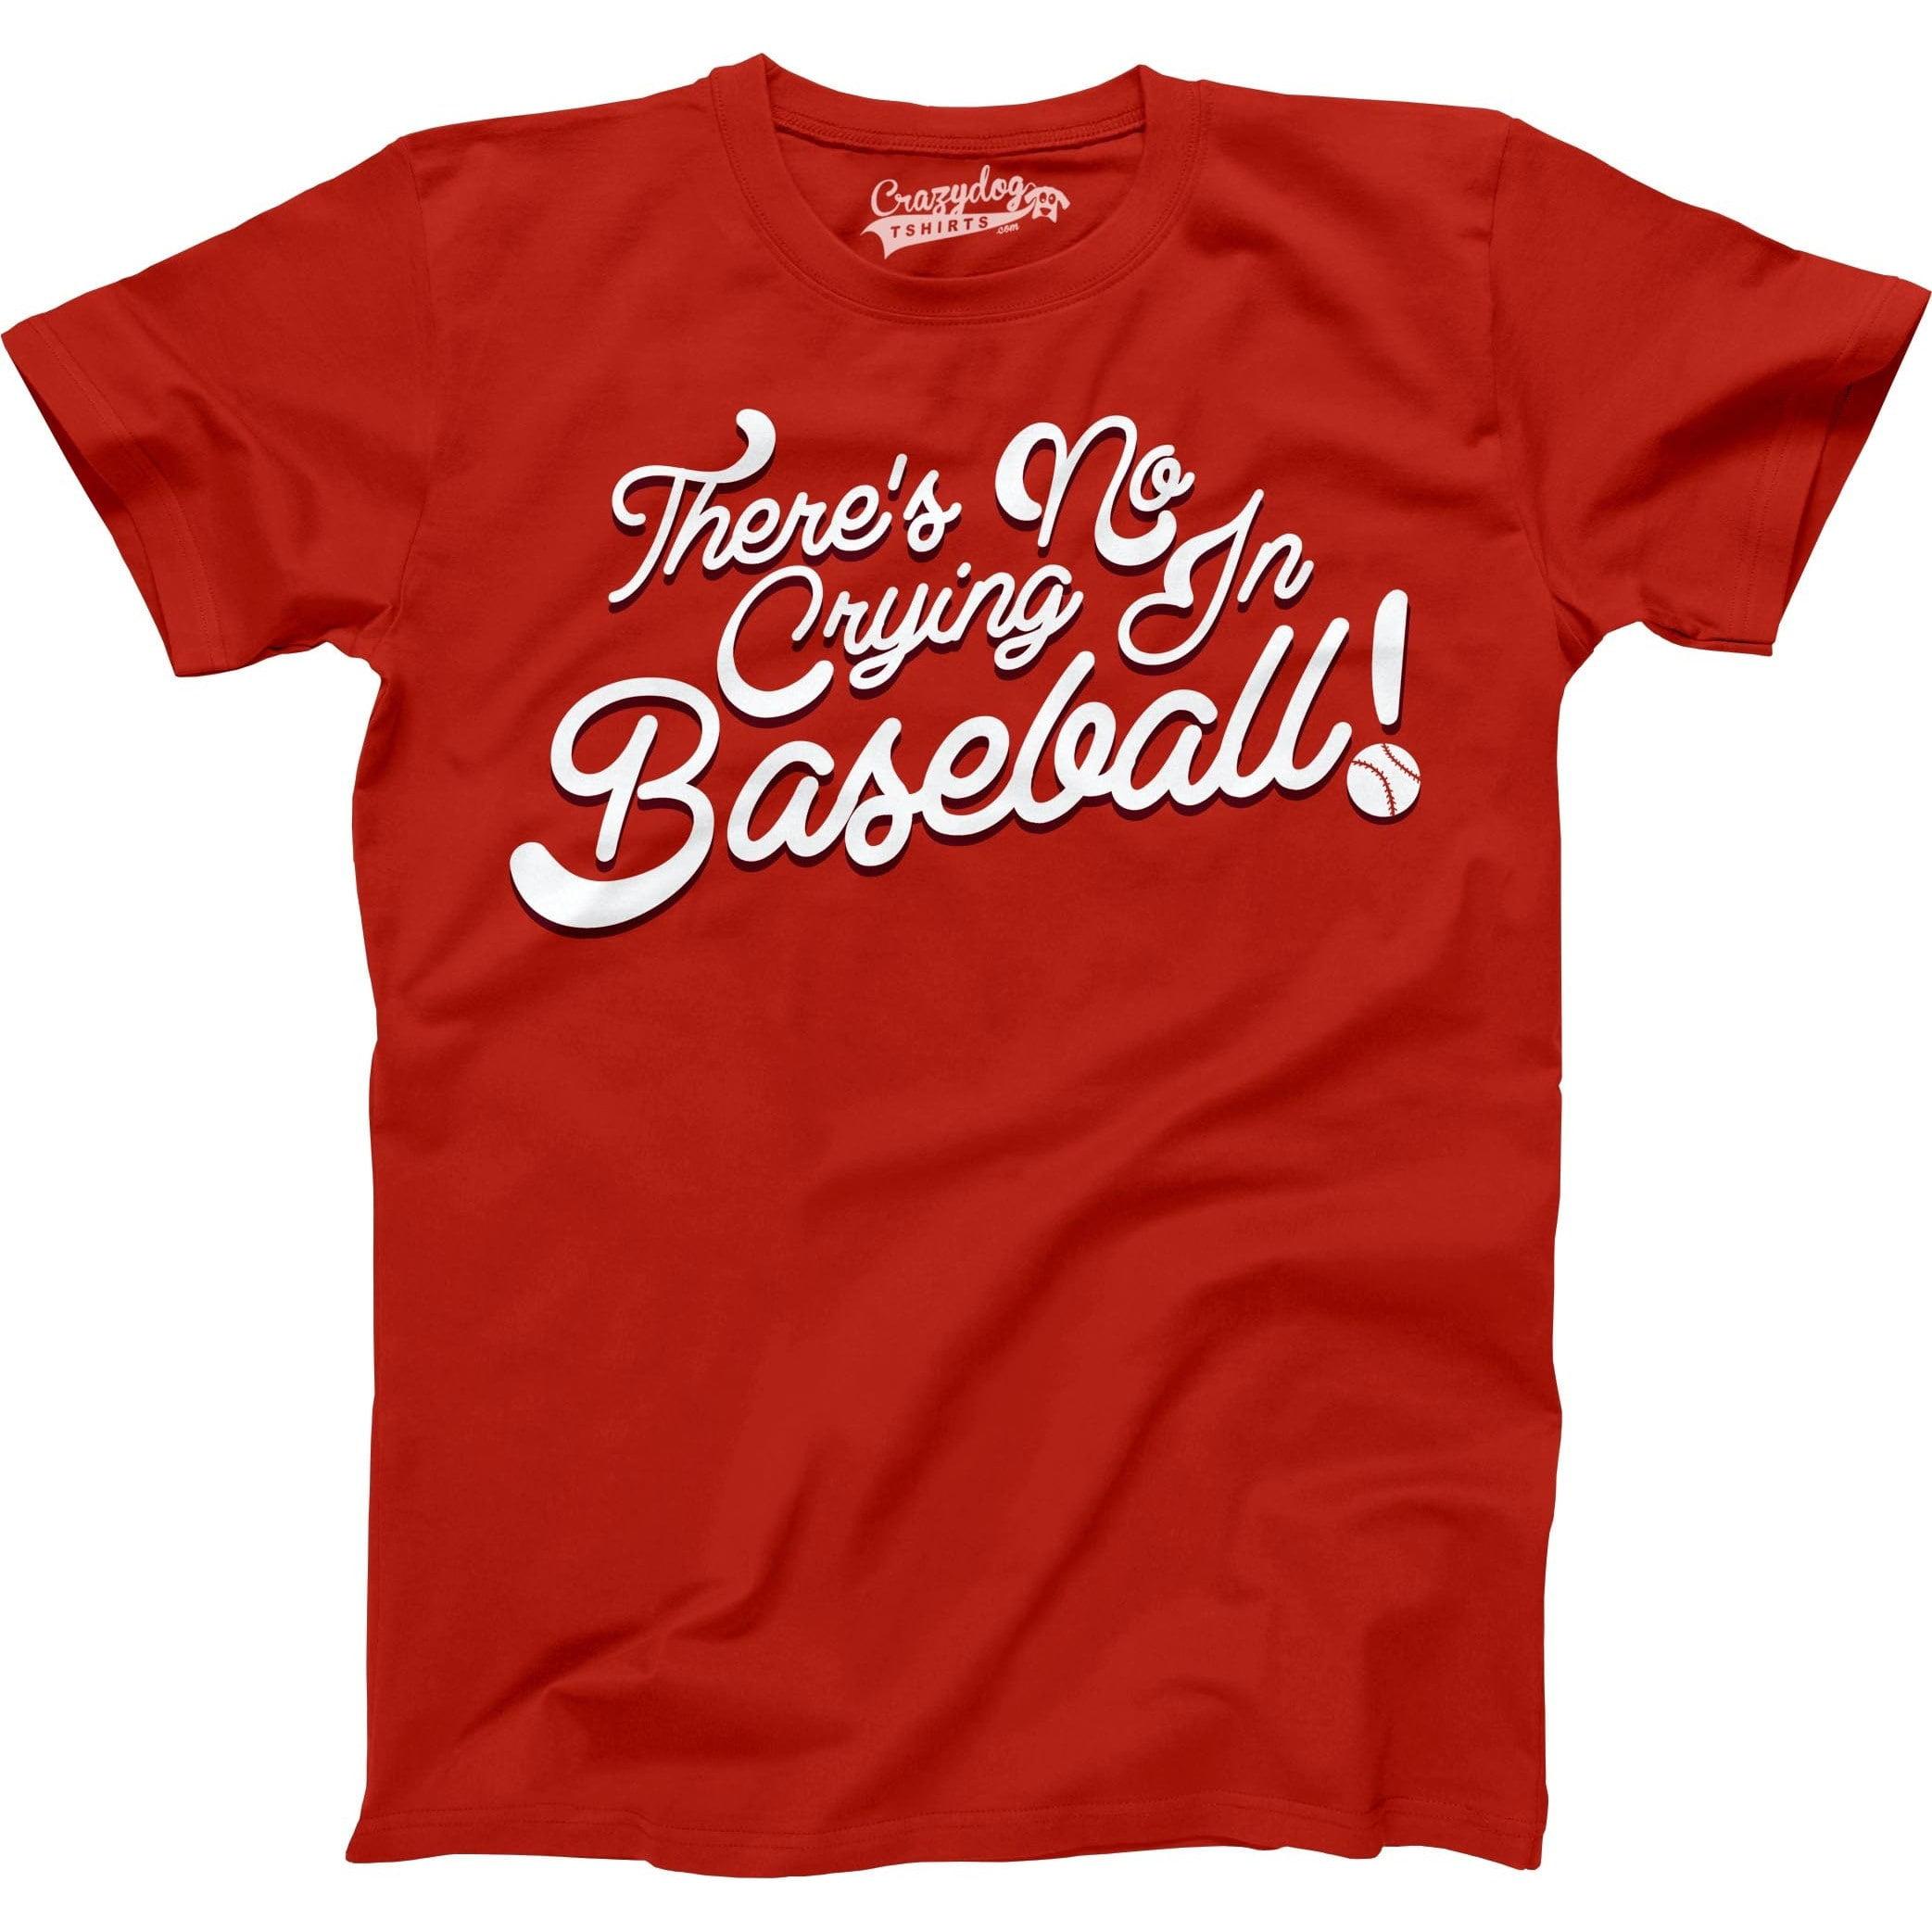 2478cc31 No Crying In Baseball T Shirt Funny 80s Shirts Retro Sports League Tee -  Walmart.com